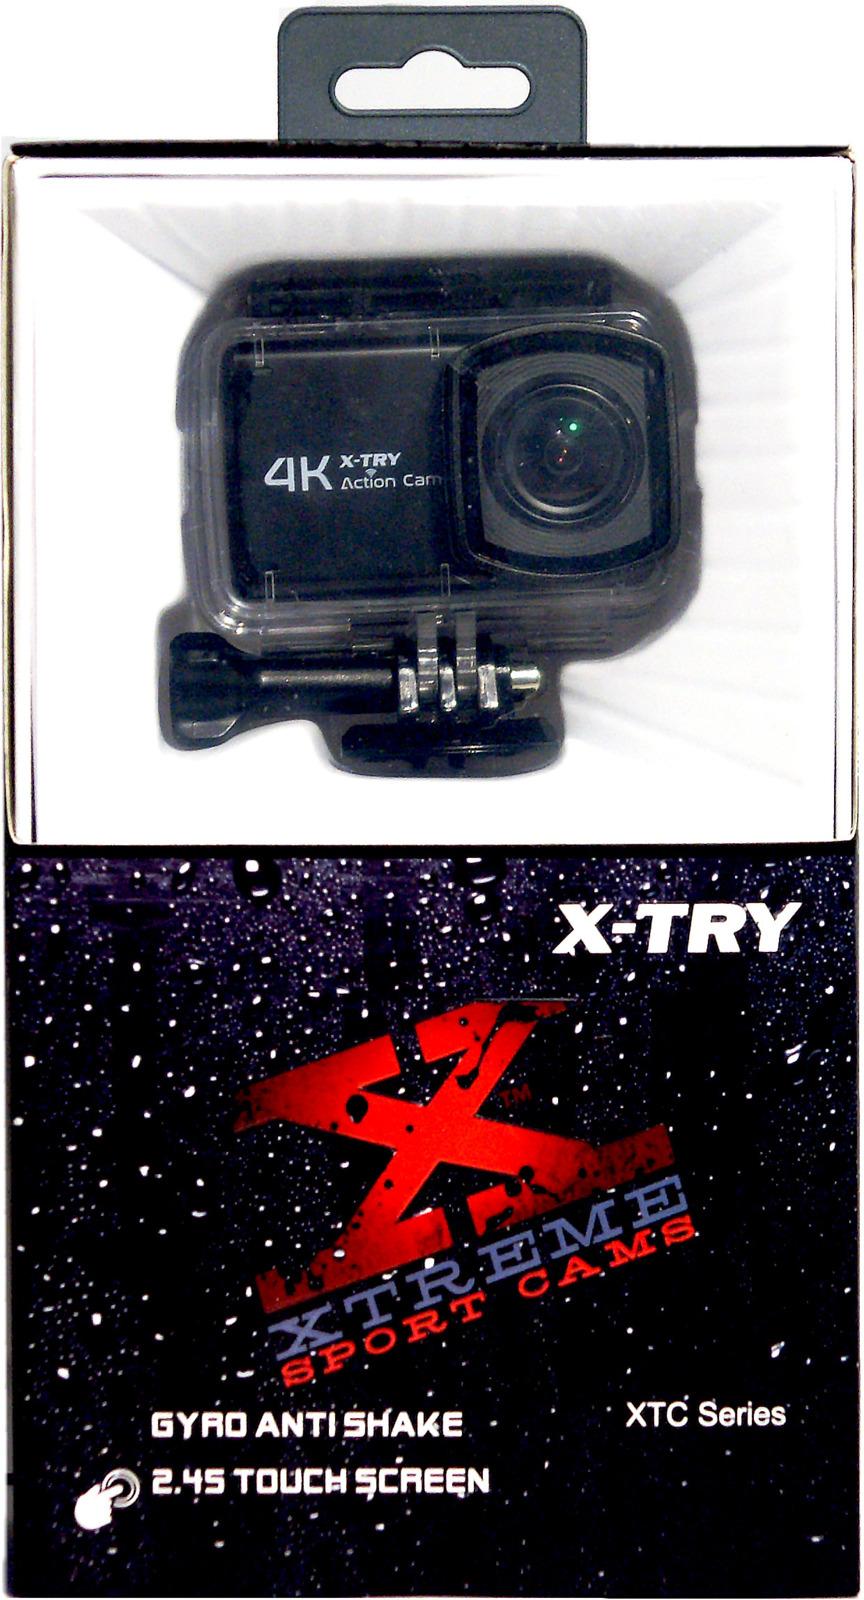 Экшн-камера X-Try XTC442 Autokit Touch UltraHD 4K + Remote X-Try